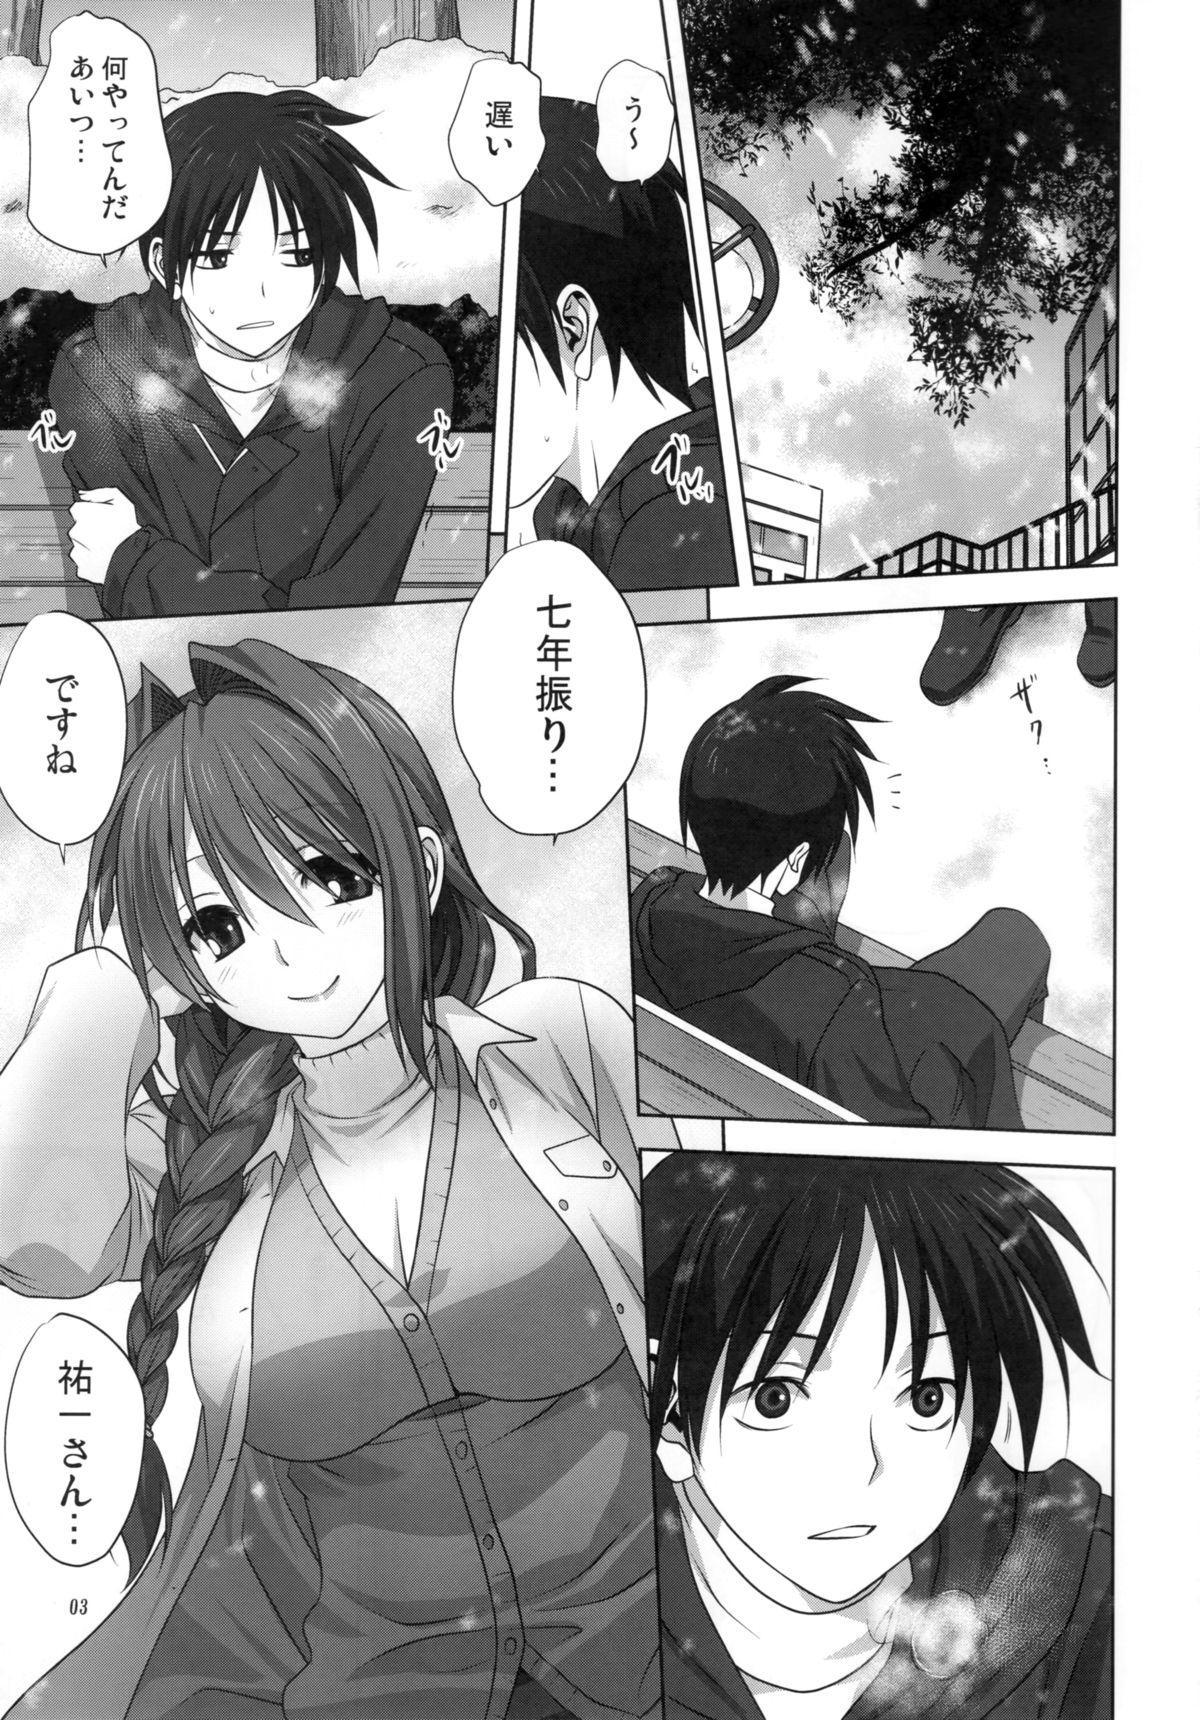 Akiko-san to Issho 16 1